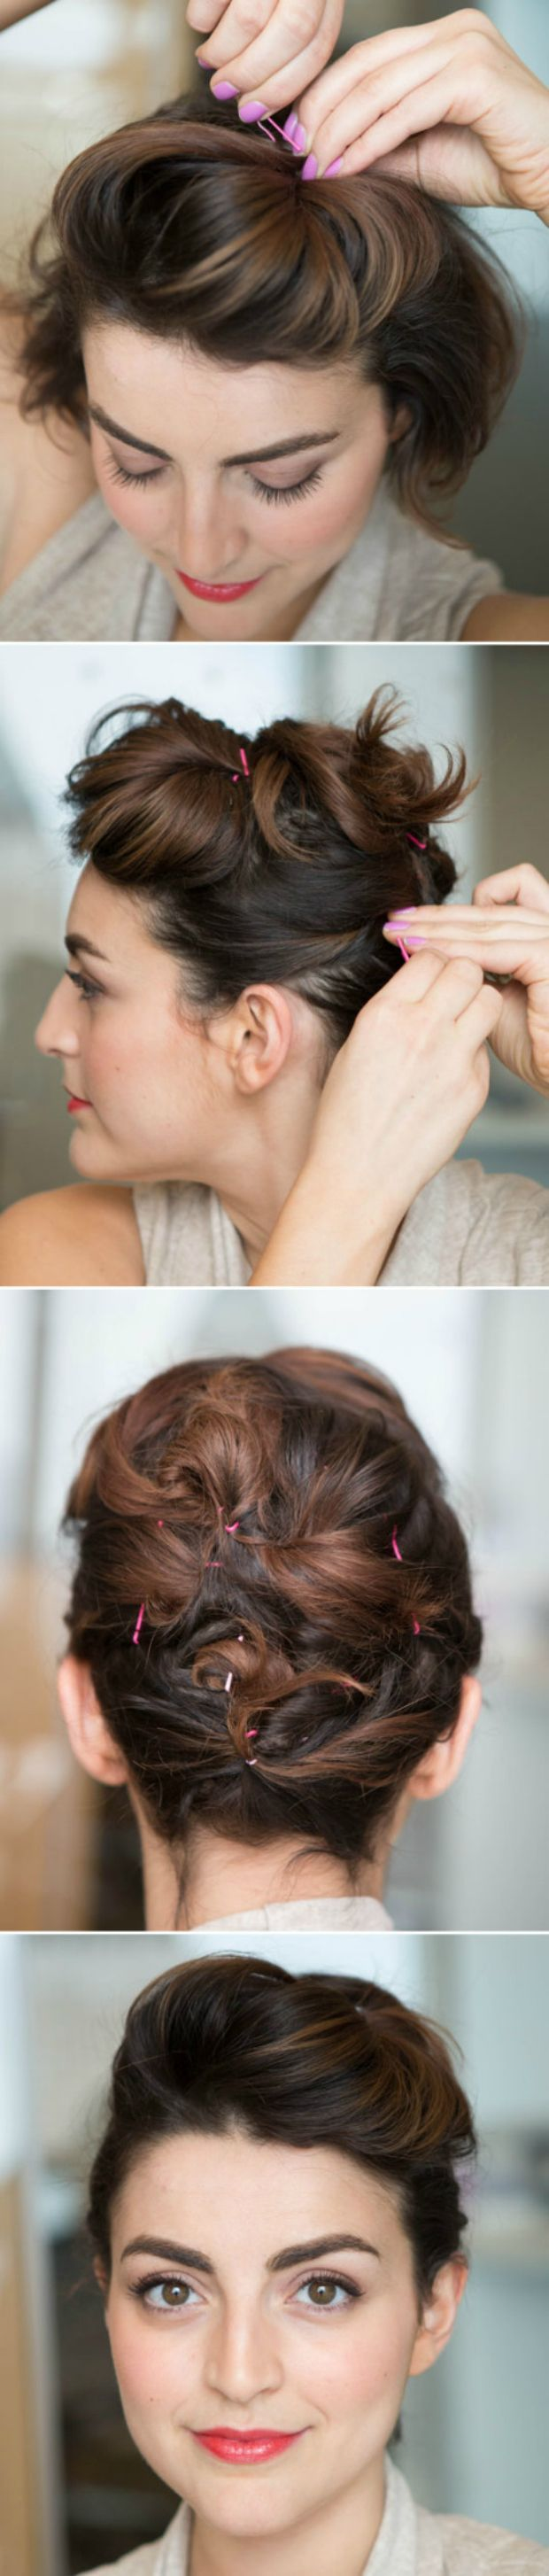 15+Genius+Tricks+for+Styling+Short+Hair - GoodHousekeeping.com